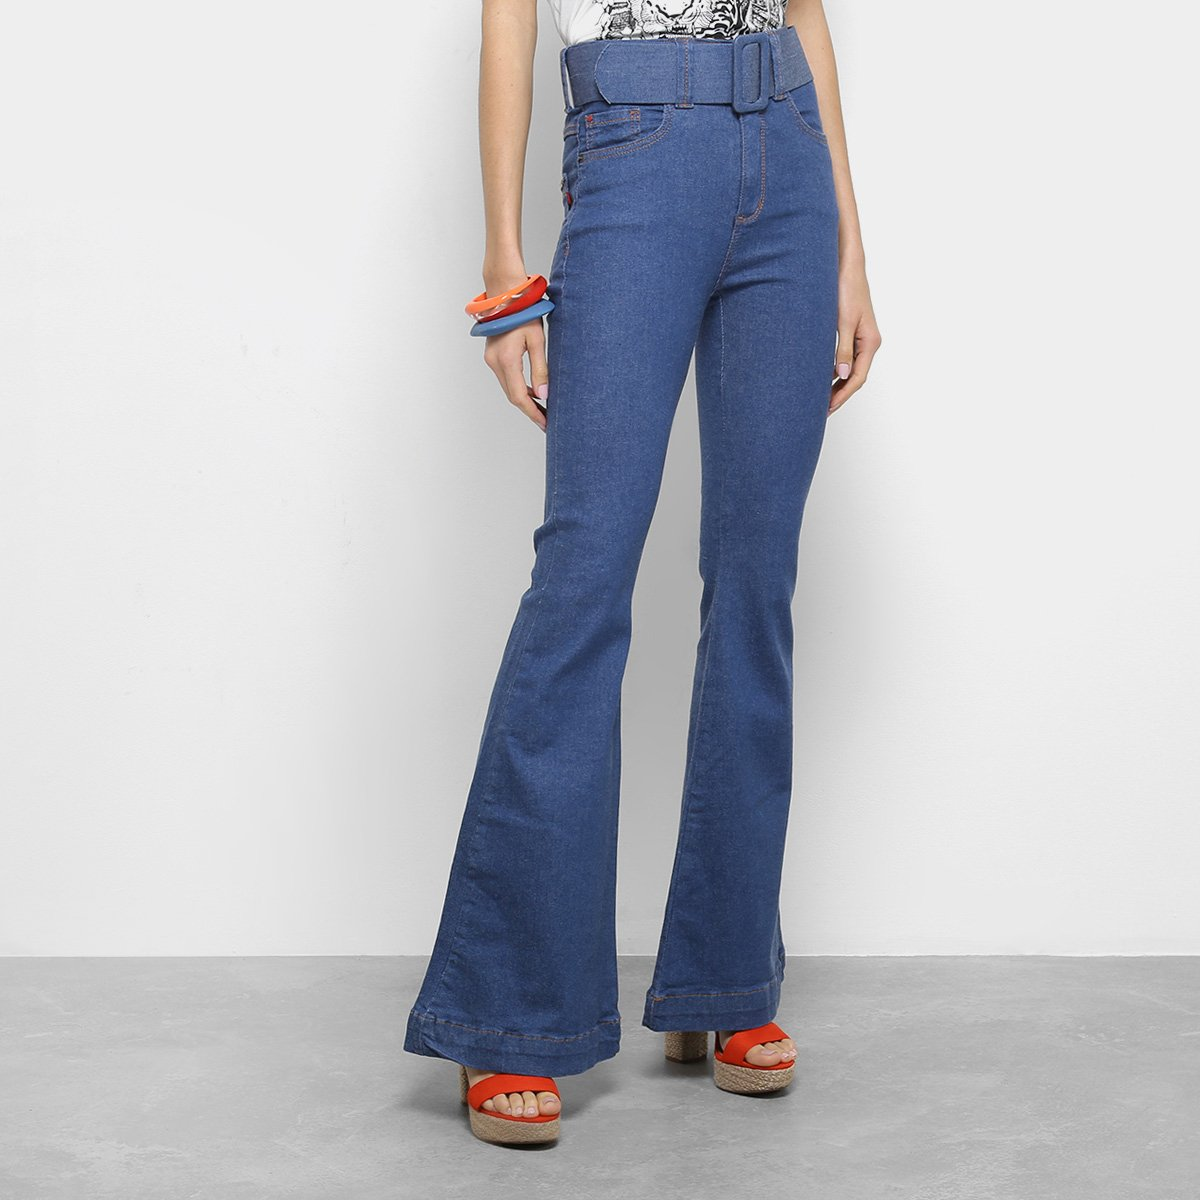 a6ee70c45 Calça Jeans Flare Forum Com Maxi Cinto Cintura Alta Feminina